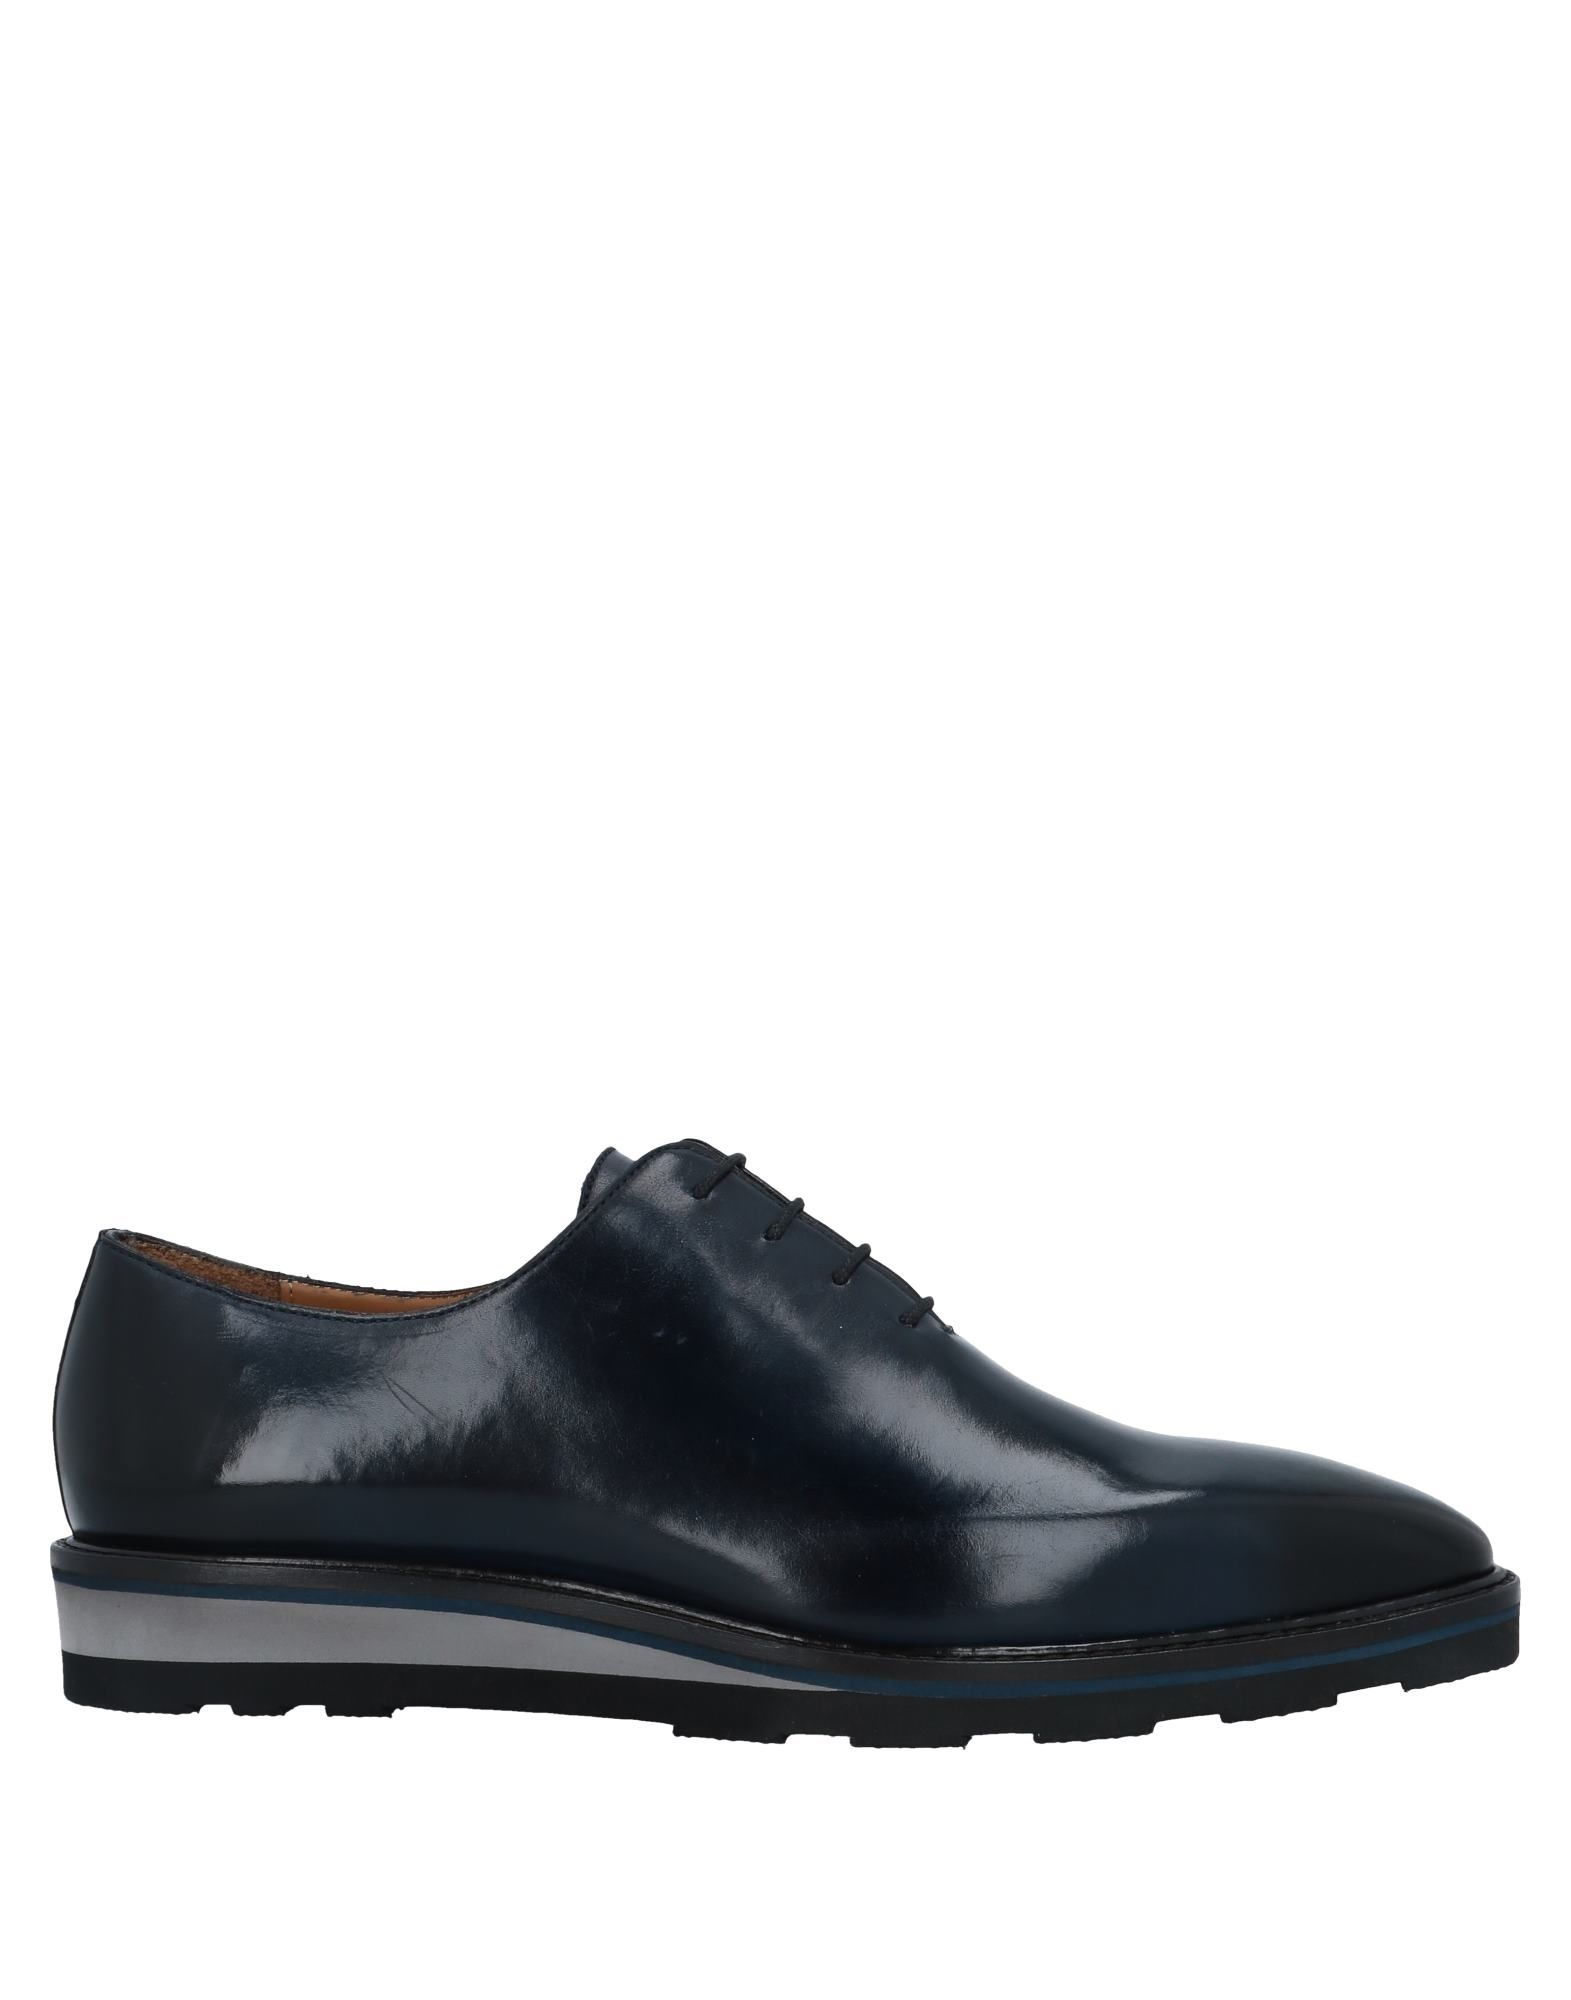 TROFEO by STEFANO BRANCHINI Обувь на шнурках